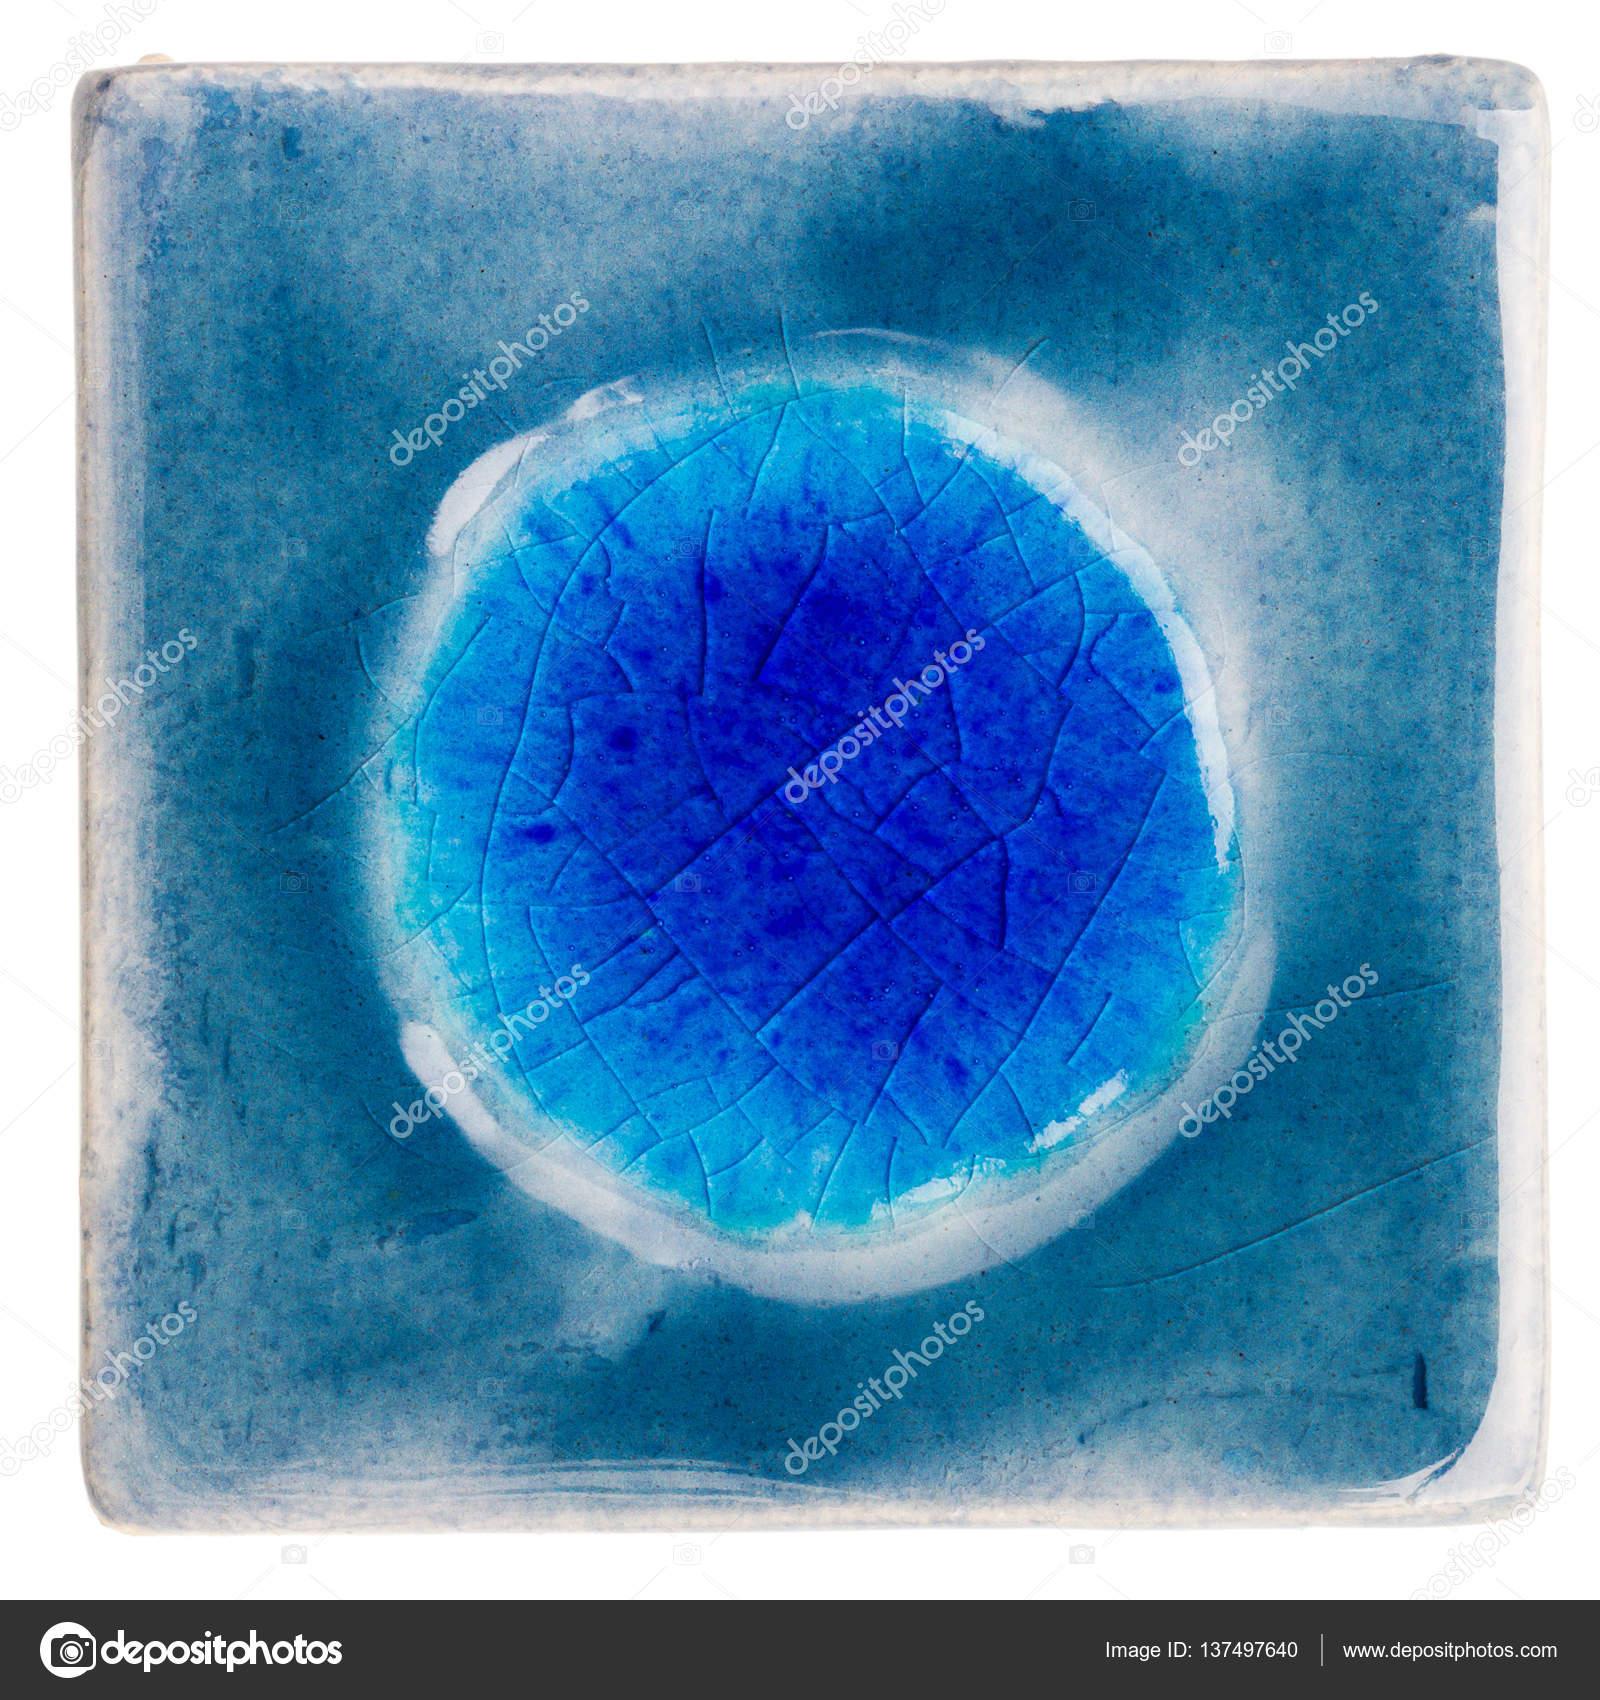 Handmade glazed ceramic tile stock photo taigi 137497640 blue handmade glazed ceramic tile with bubble in middle isolated on white photo by taigi dailygadgetfo Gallery